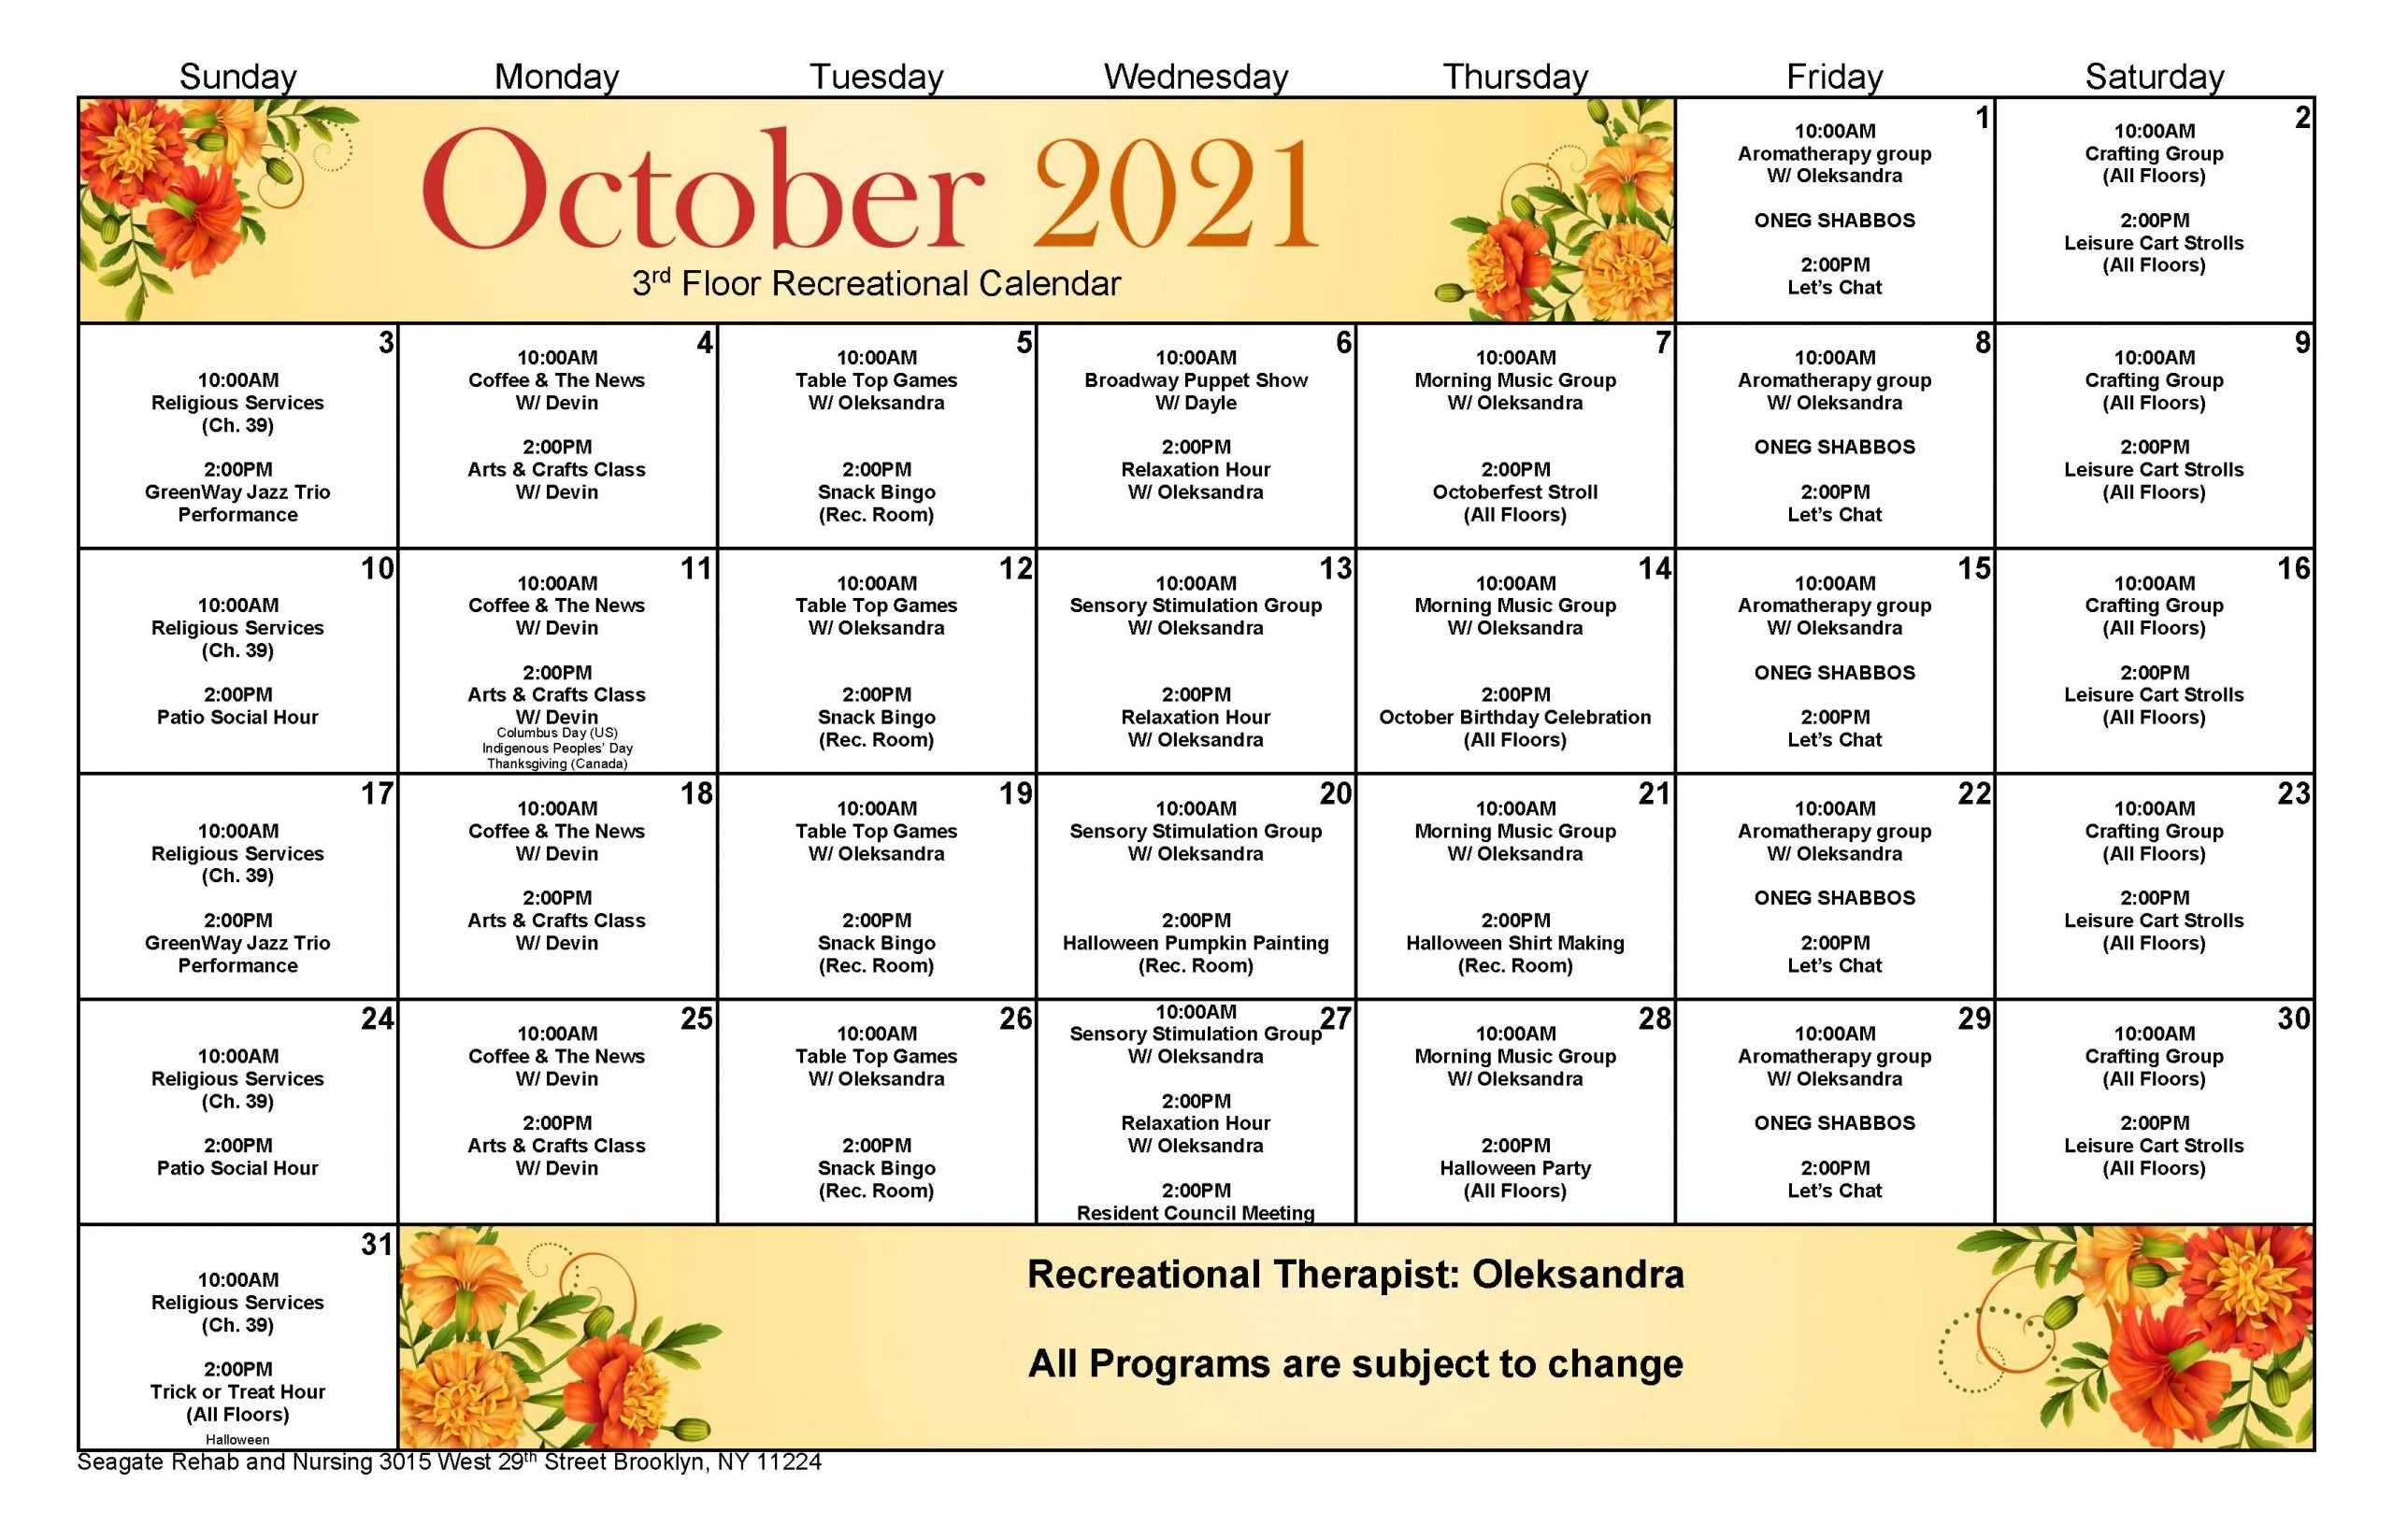 Seagate 3rd Floor Event Calendar